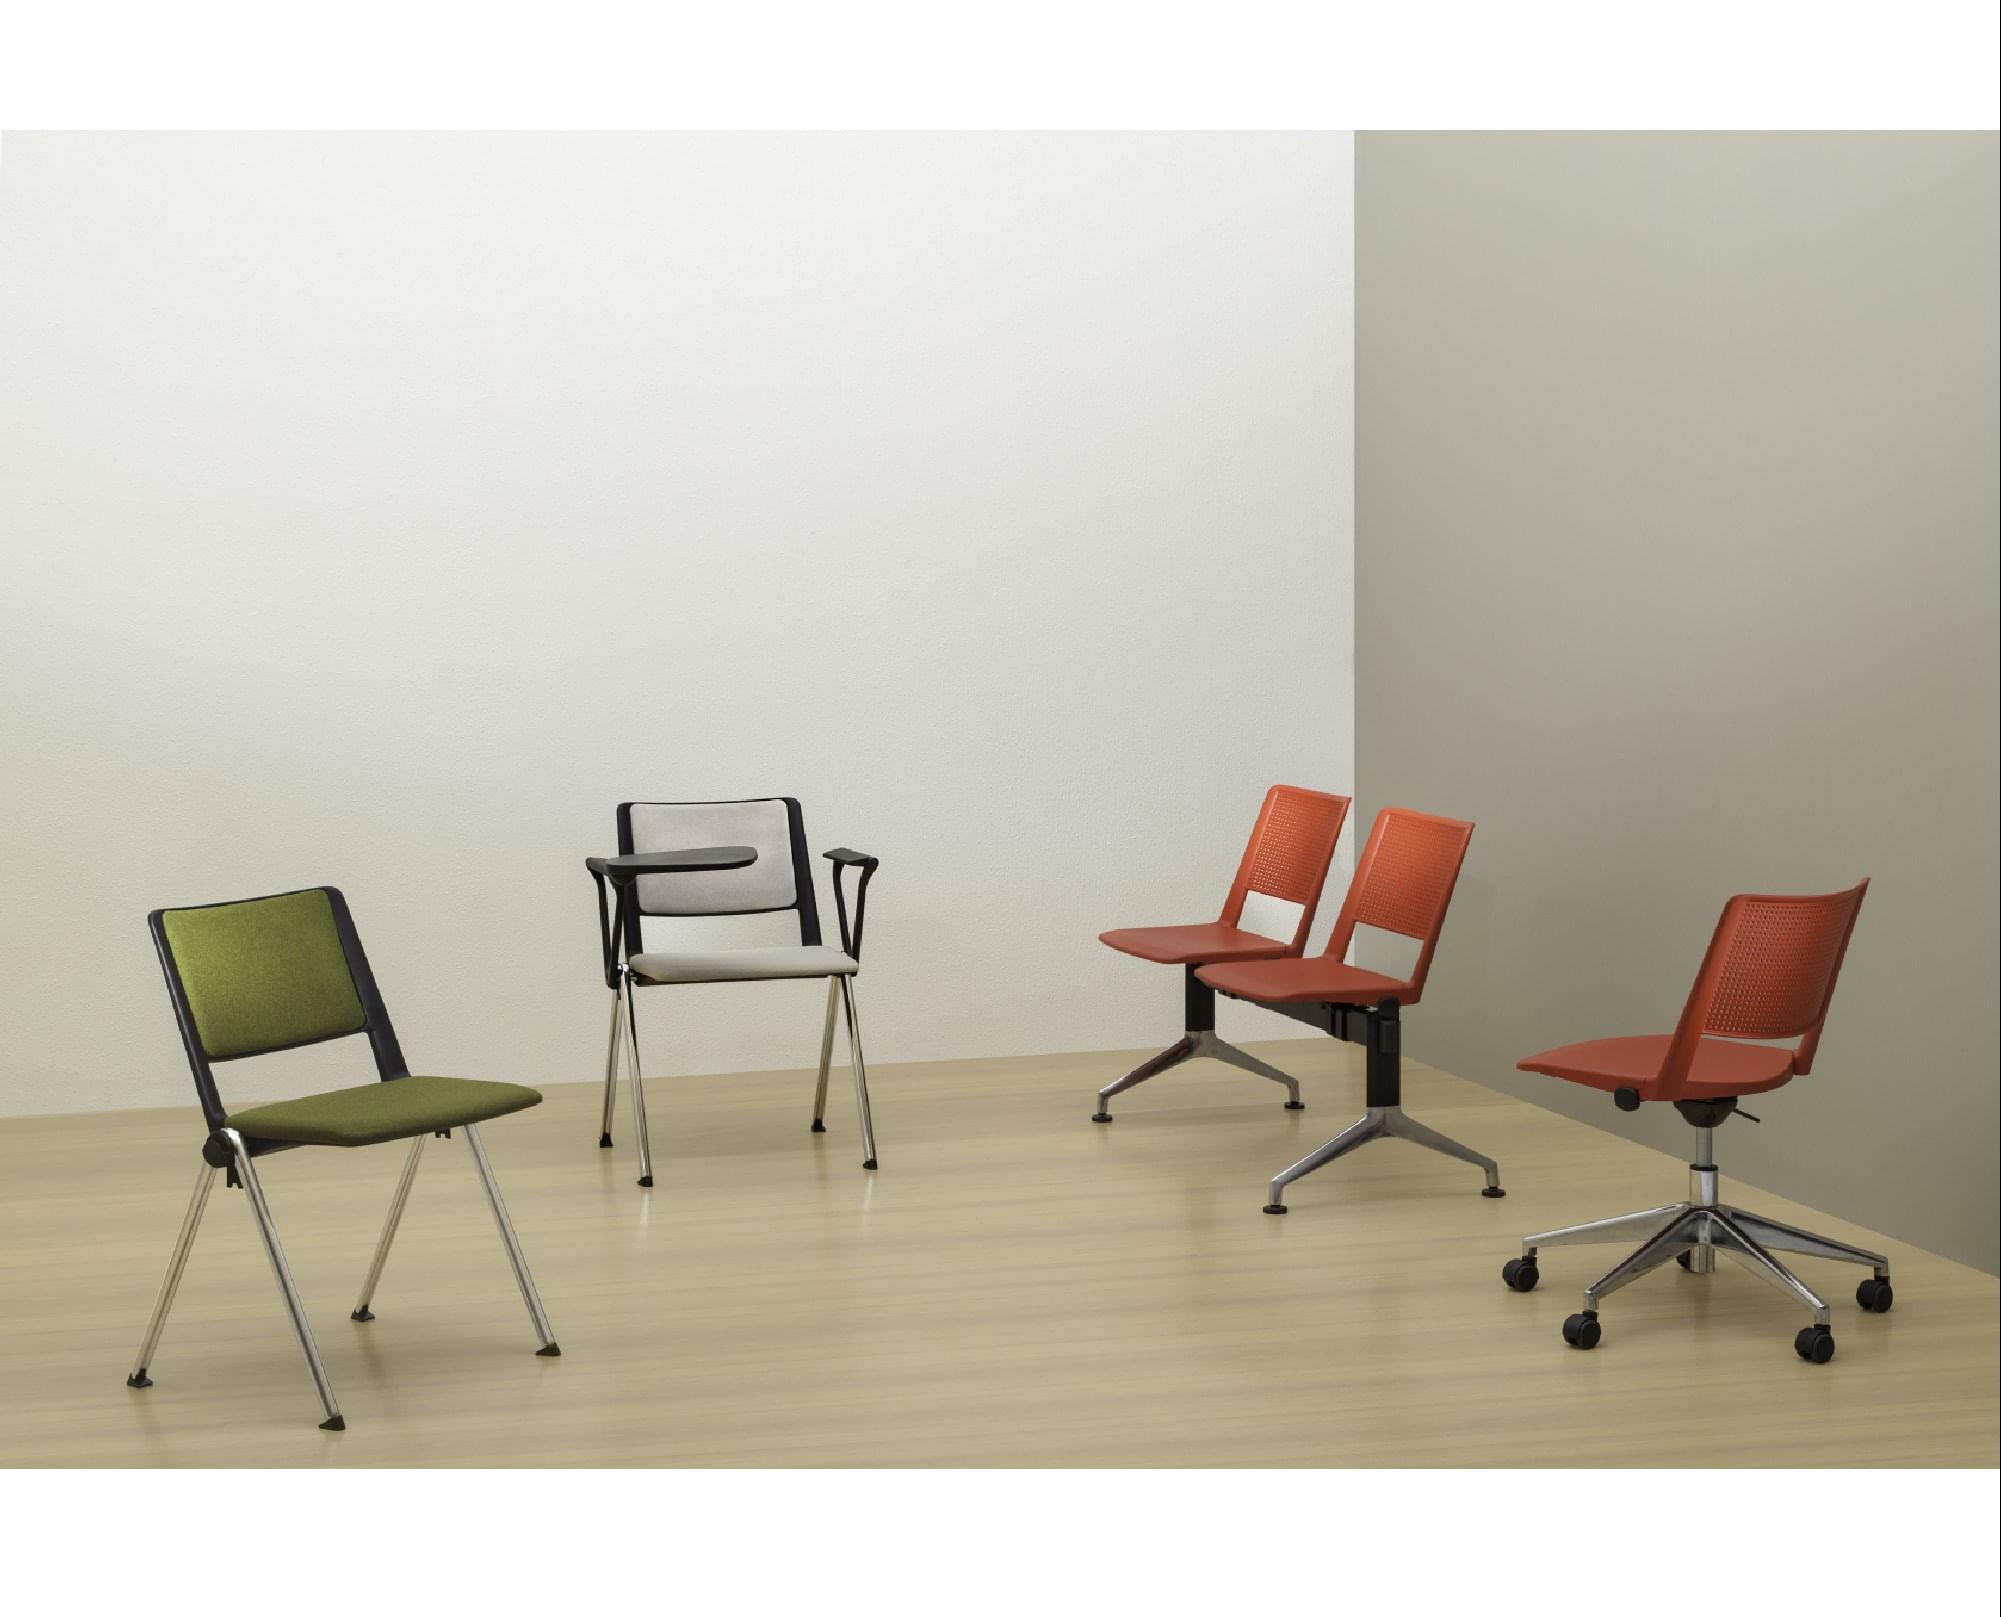 Kit 5 Cadeiras Up Assento Marrom Base Fixa Cromada - 57827